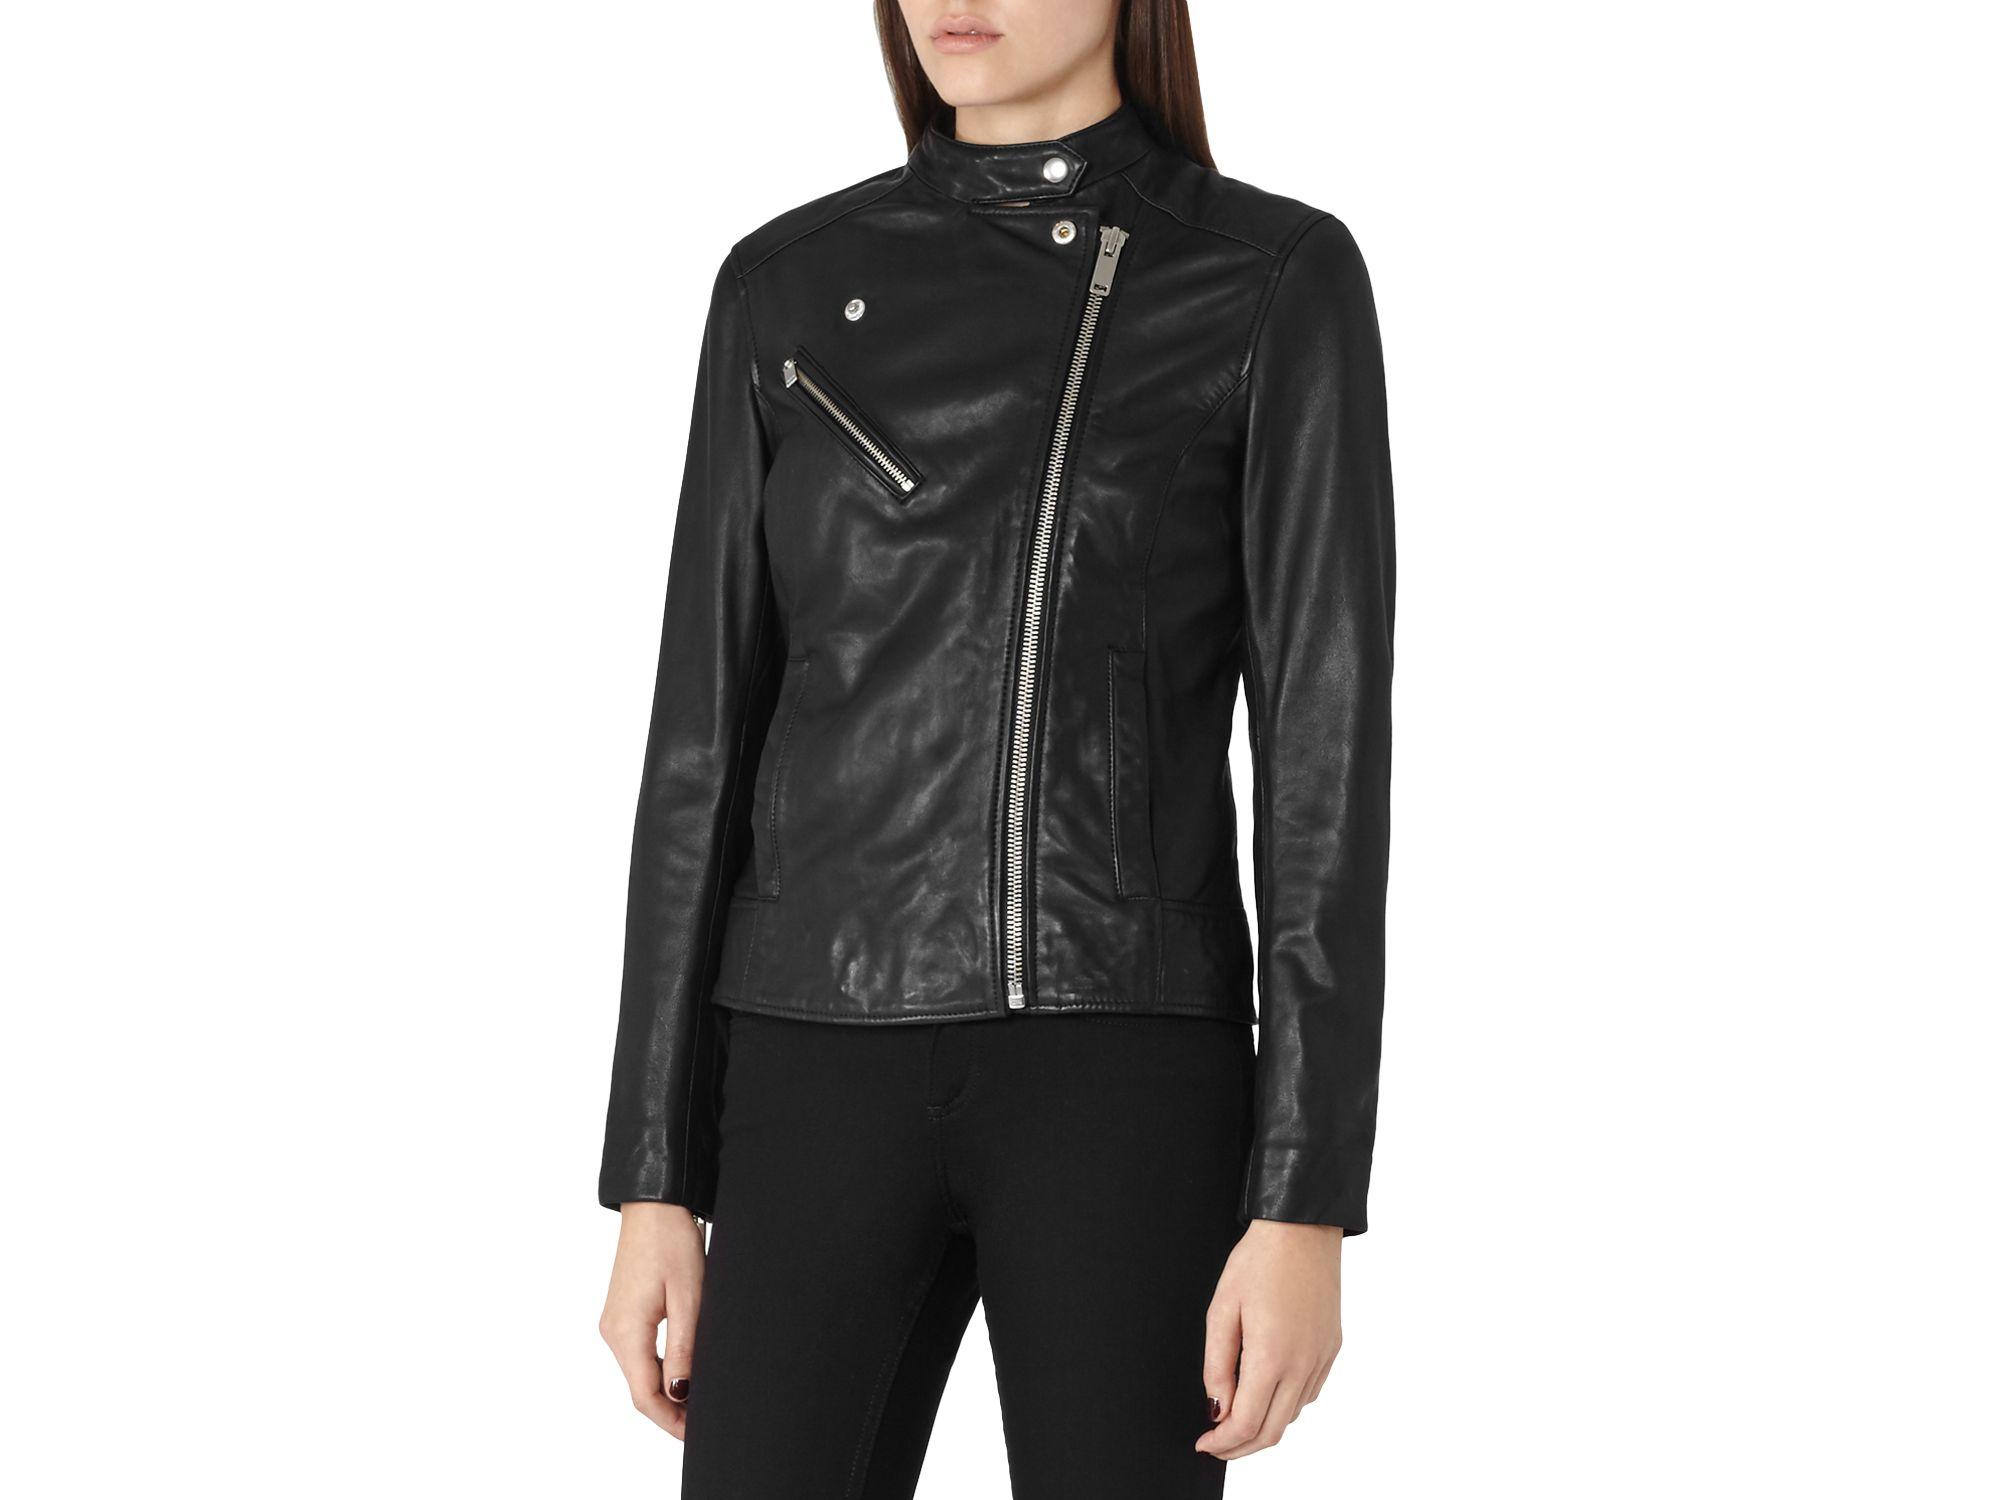 c4afaba36e6e Reiss Mya Leather Jacket in Black - Lyst